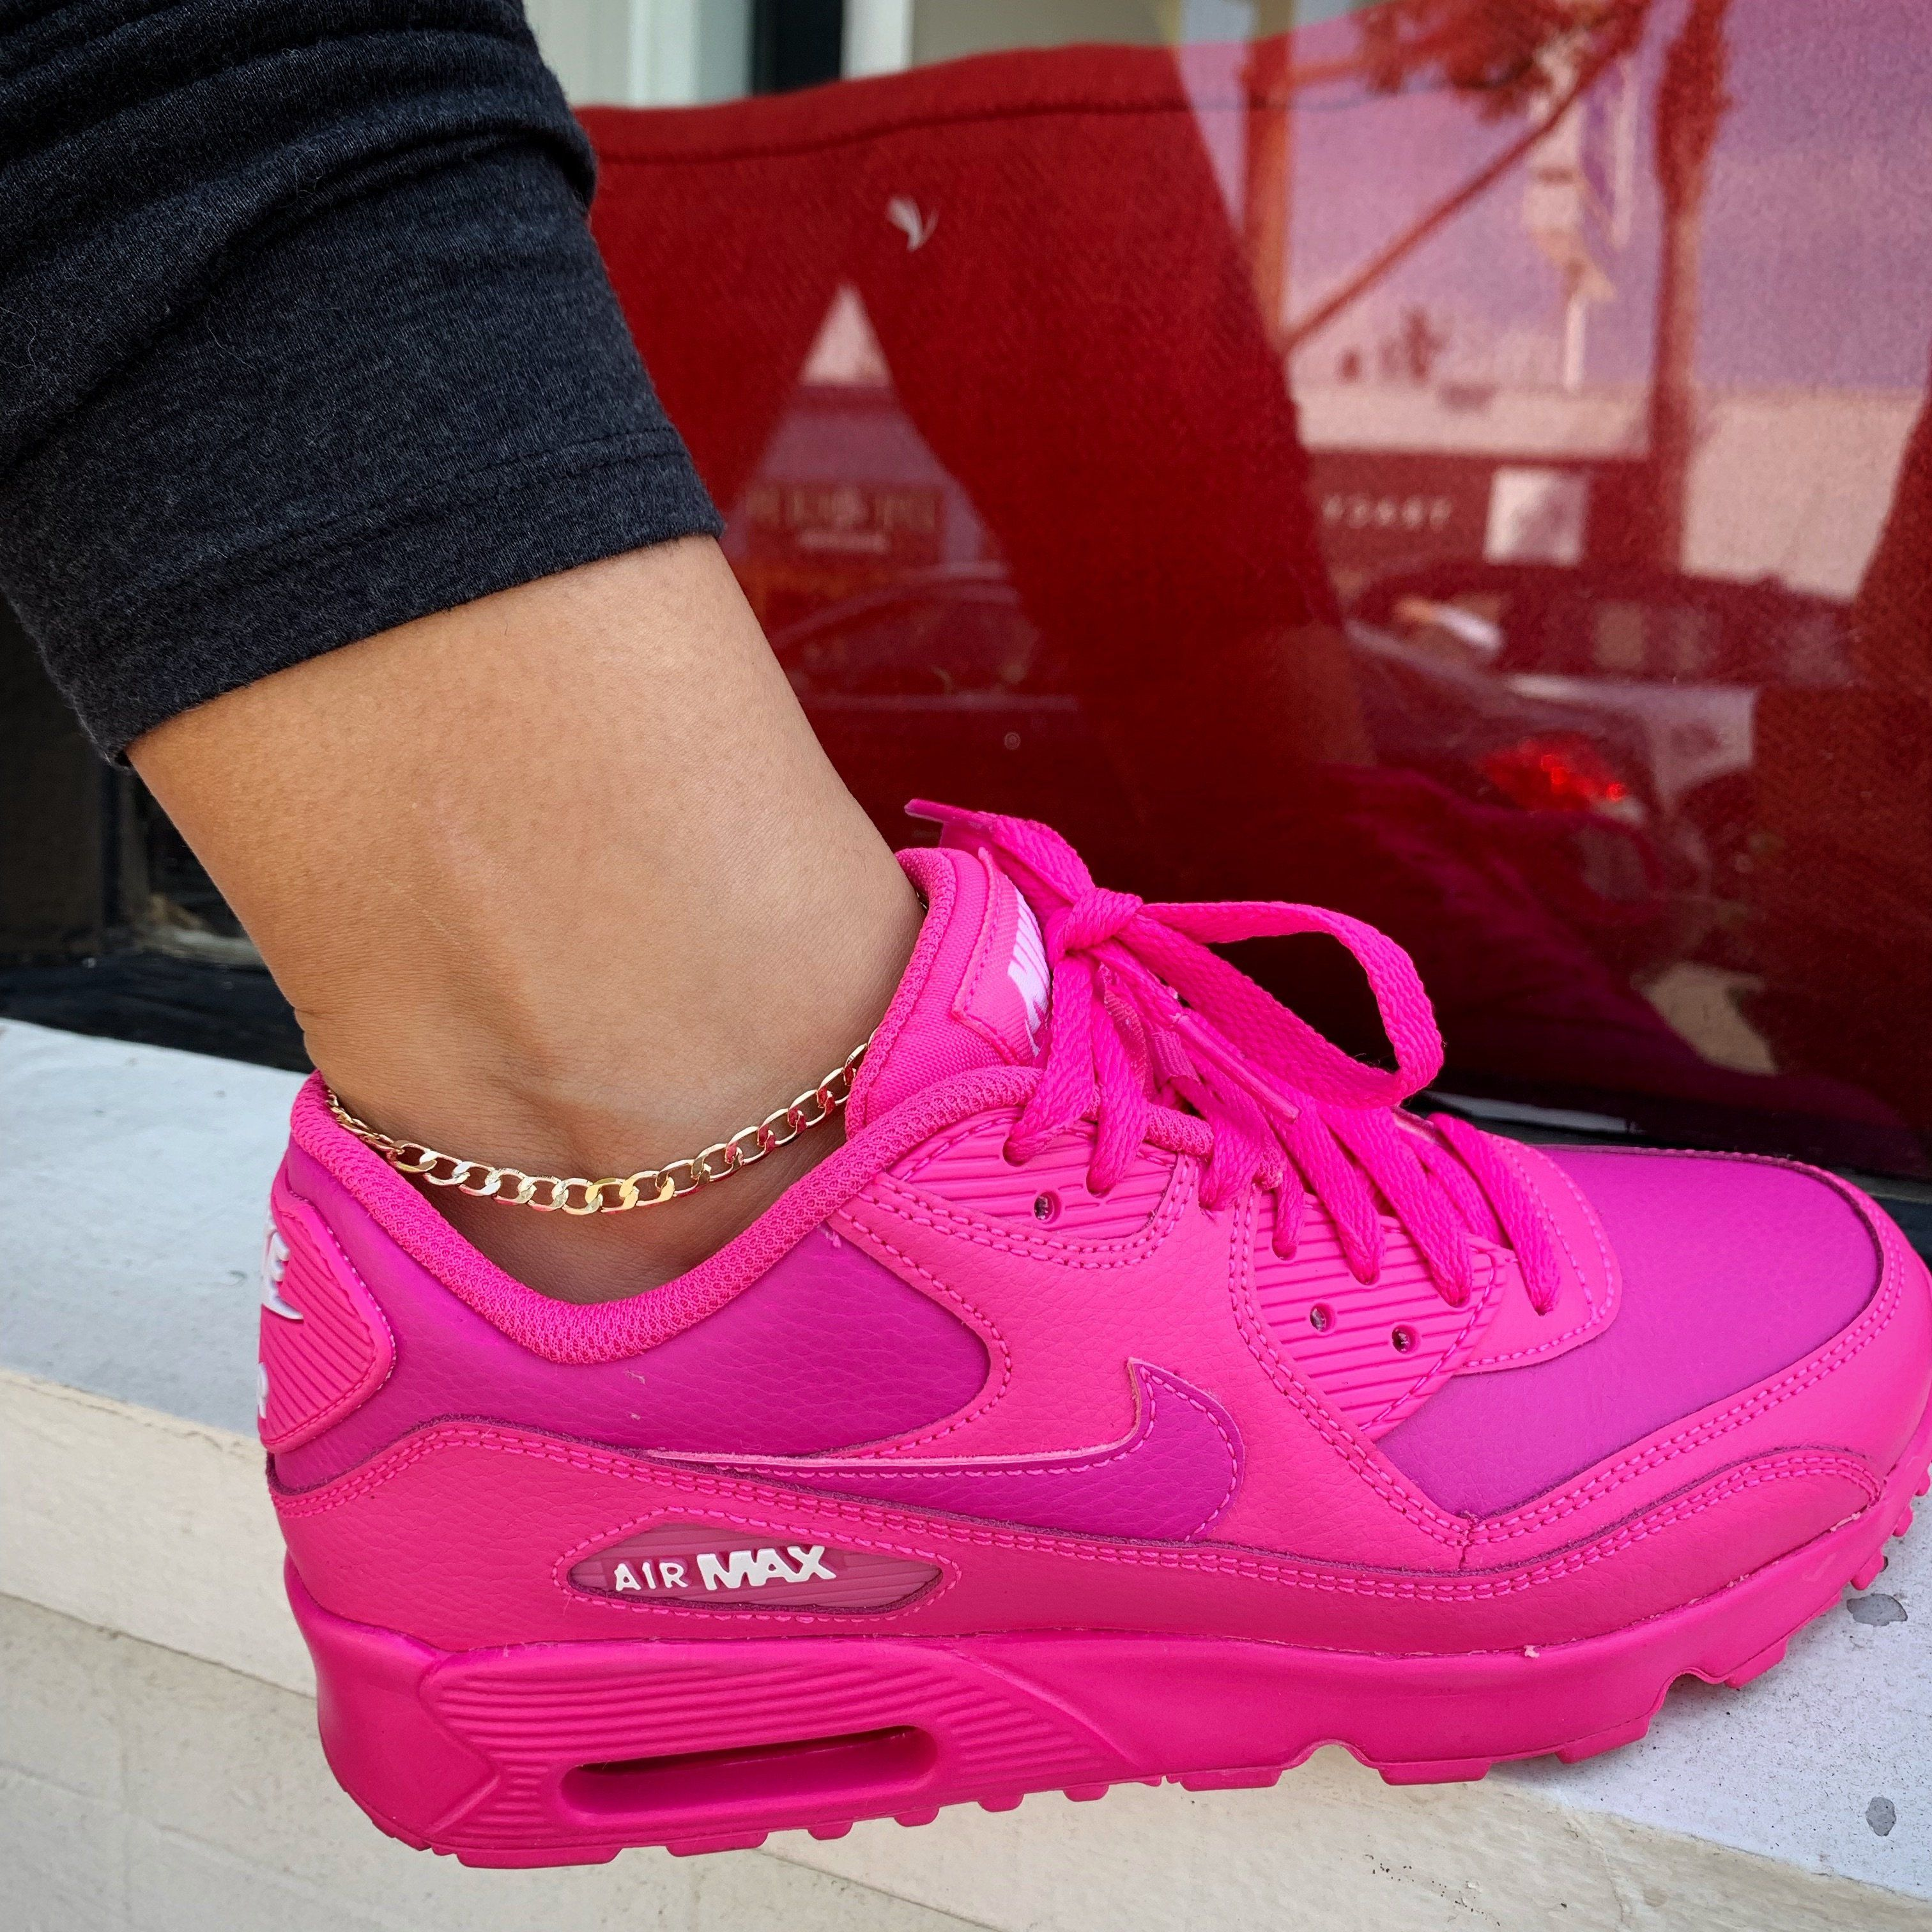 FILA Disruptor II Pink Shoes | Sapatos rosa, Tênis estilosos